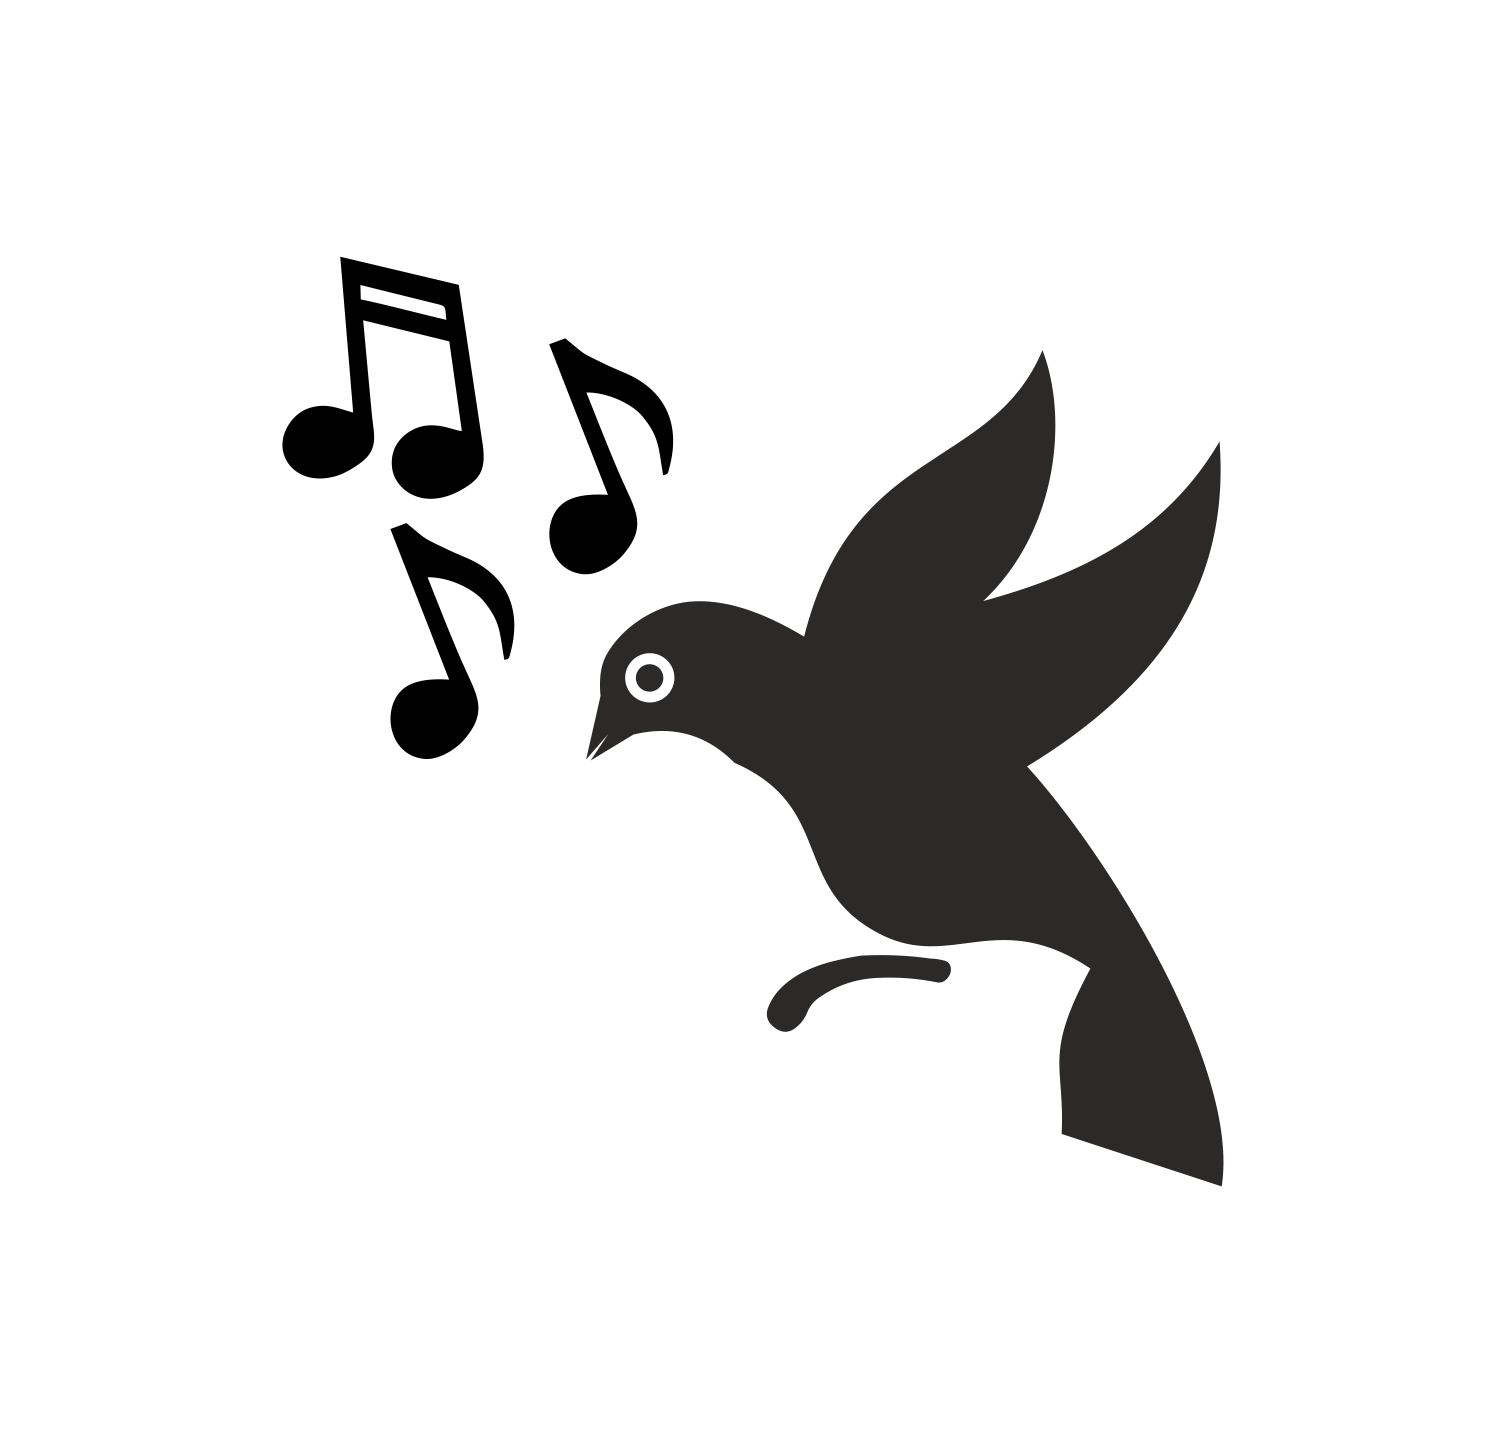 Bird Silhouette Music Free CDR Vectors Art